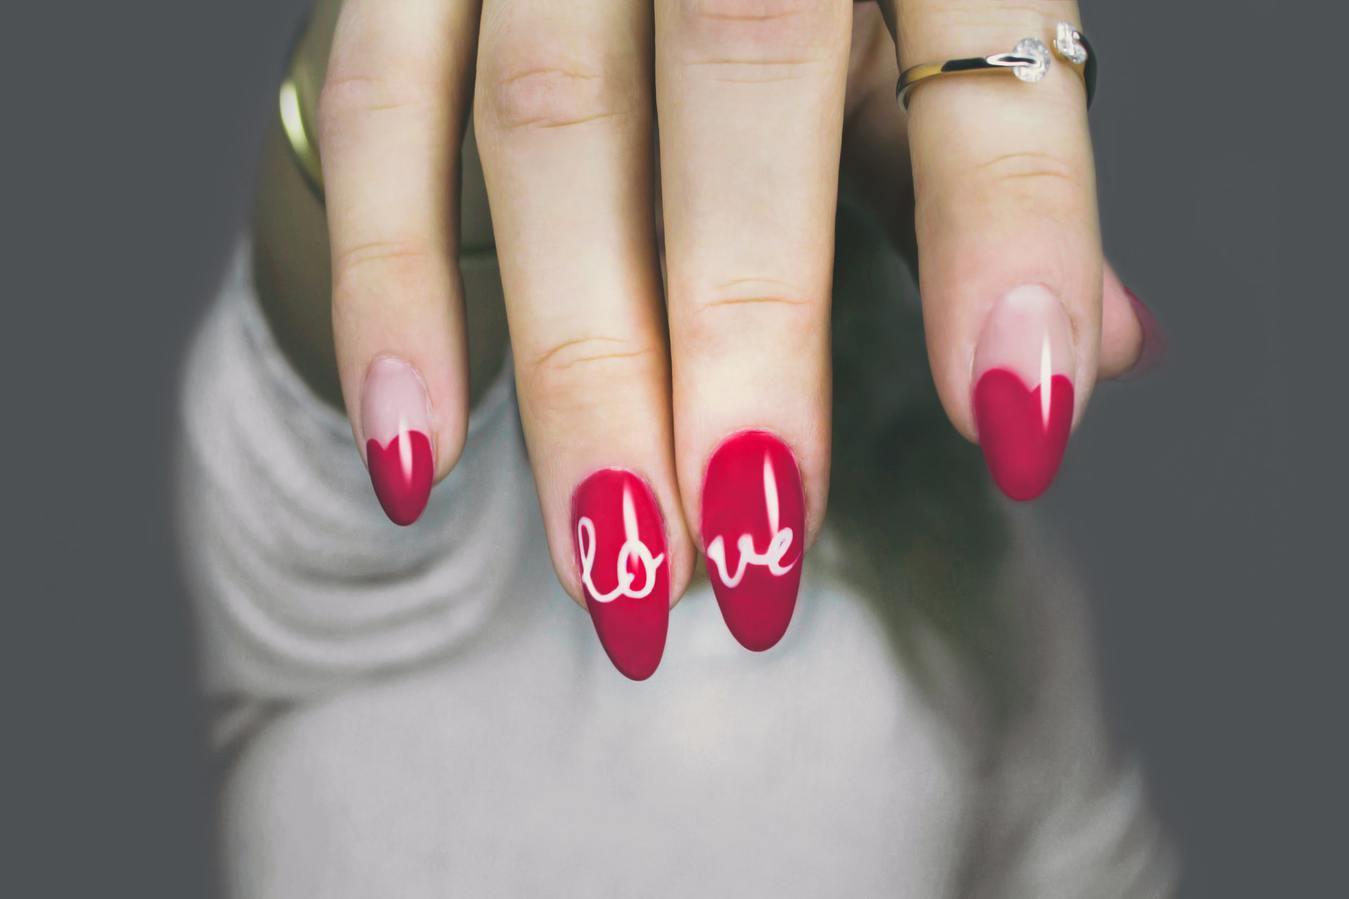 Rood gelakte nagels waar love opstaat